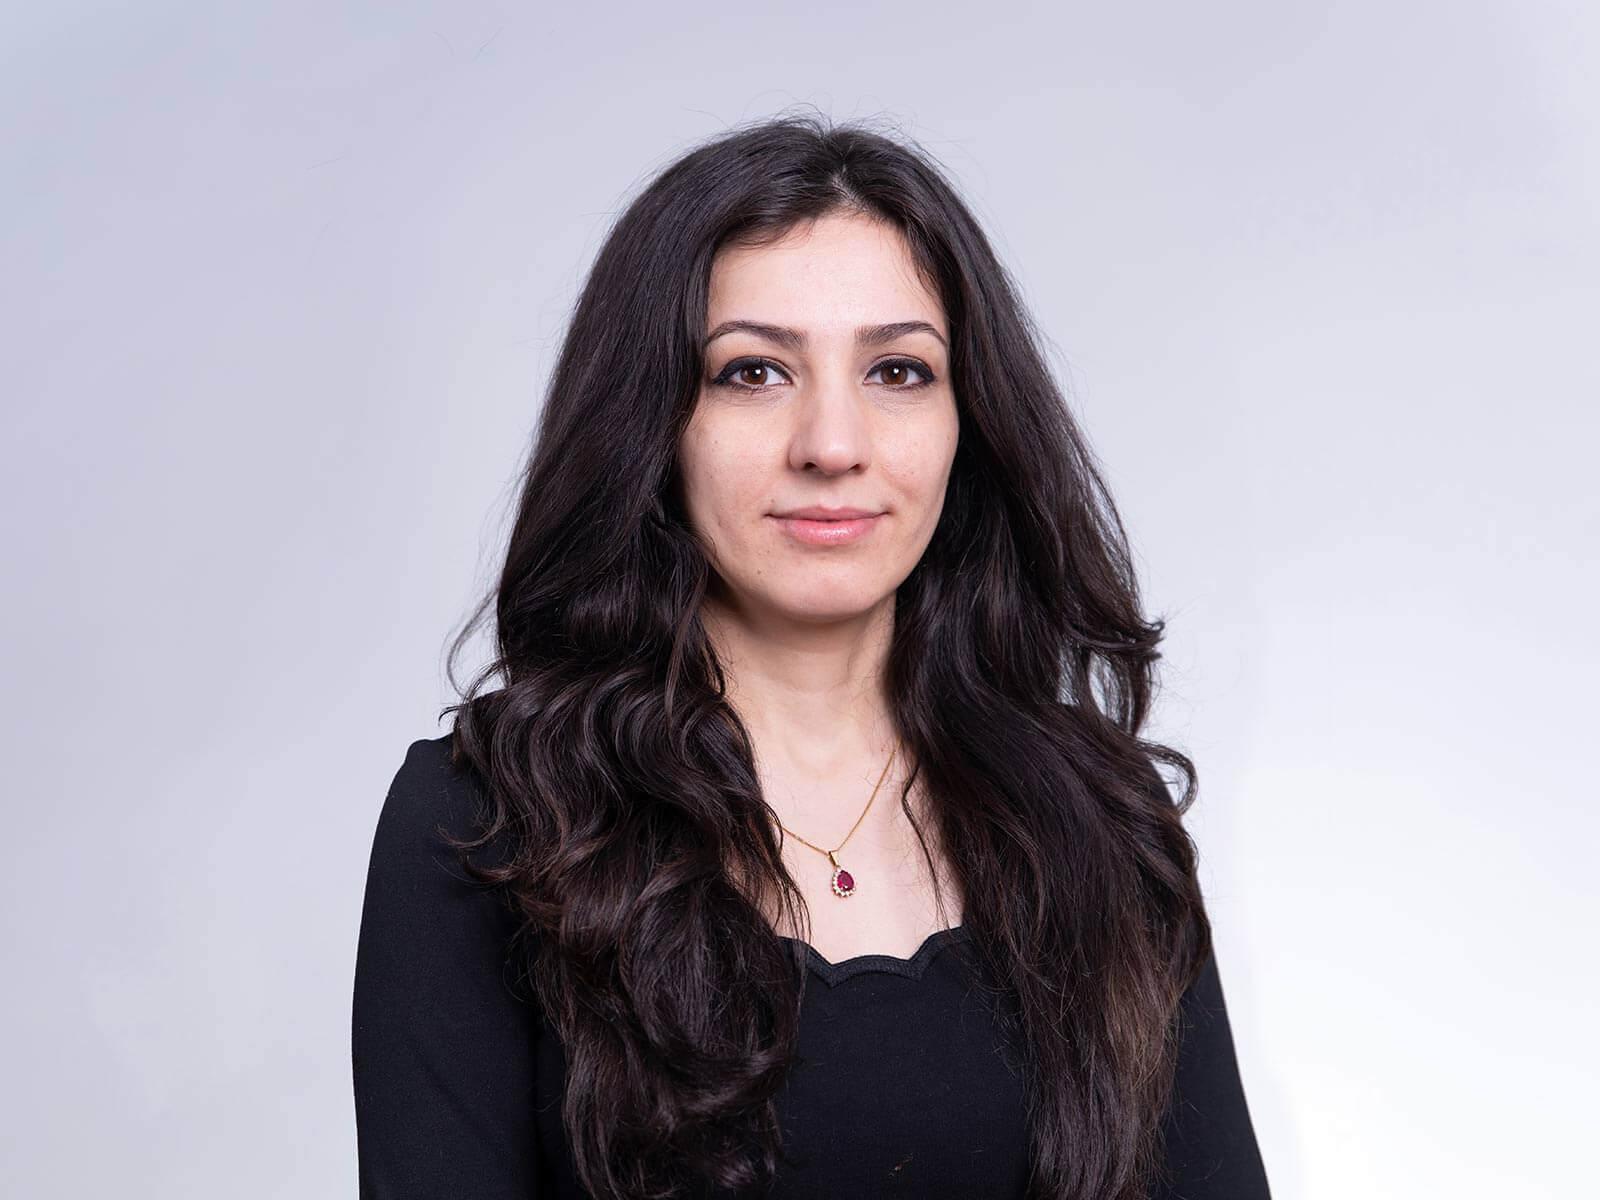 DigiPen Digital Arts instructor Zahra Haghiri